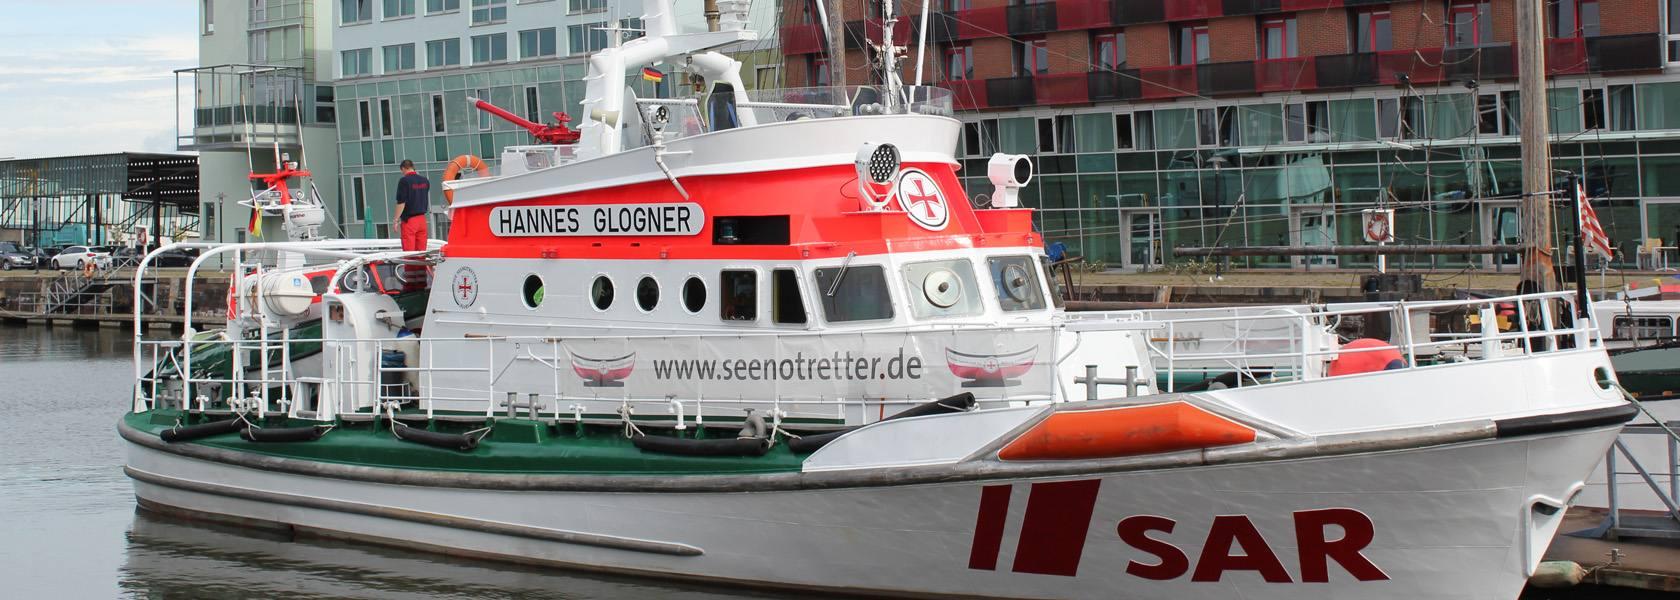 Seenotretter, © Die Nordsee GmbH, Katja Benke